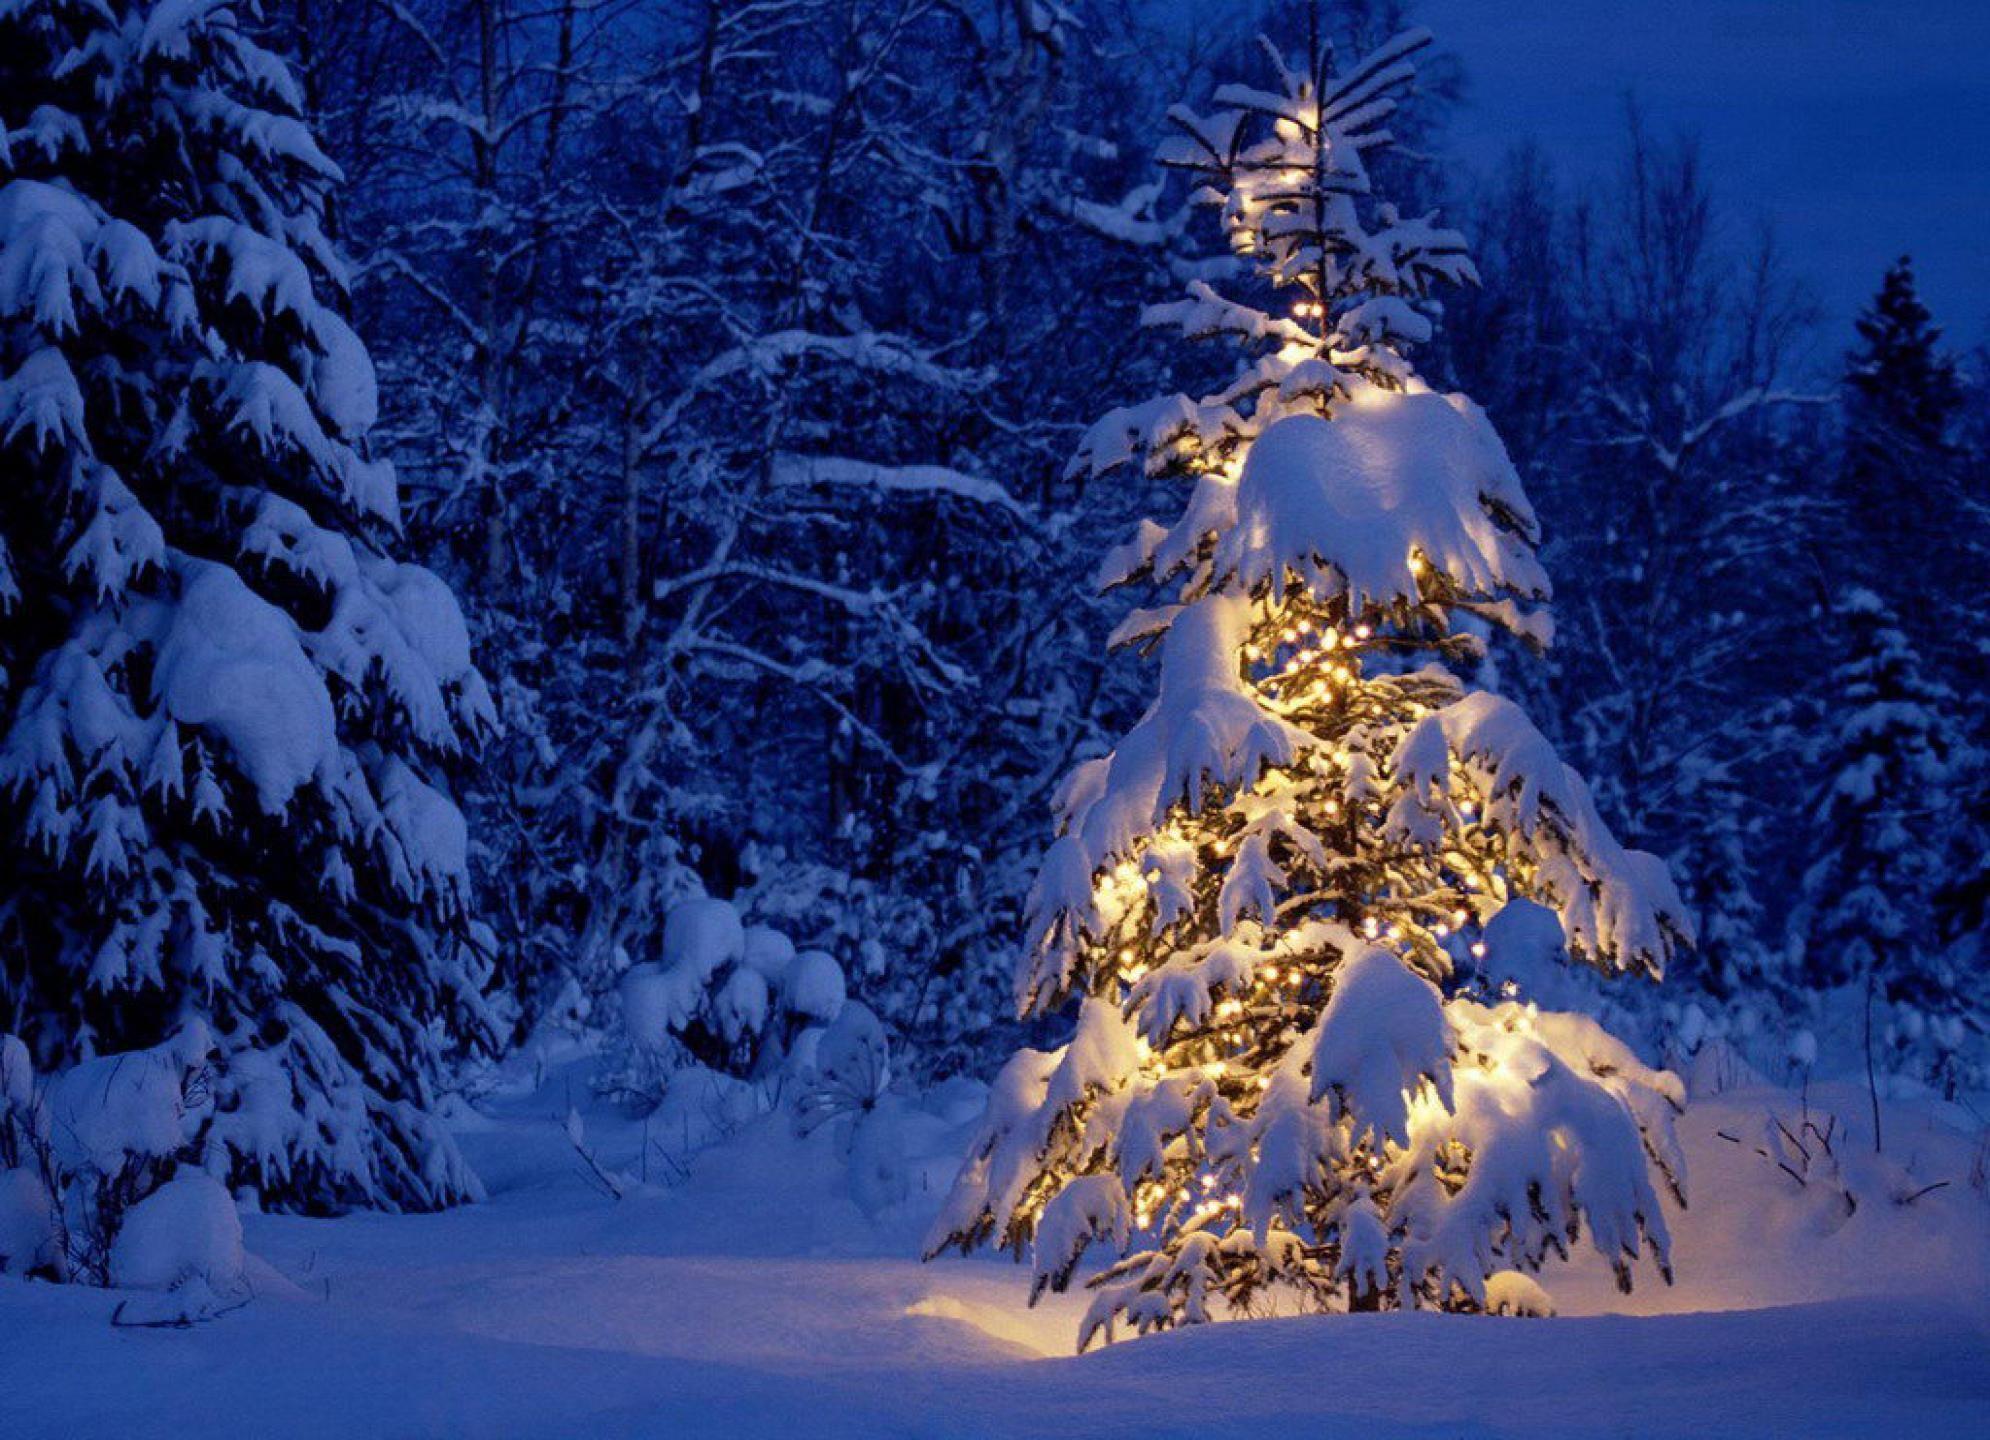 Winter Wonderland snowy winter scenes & Christmas trees